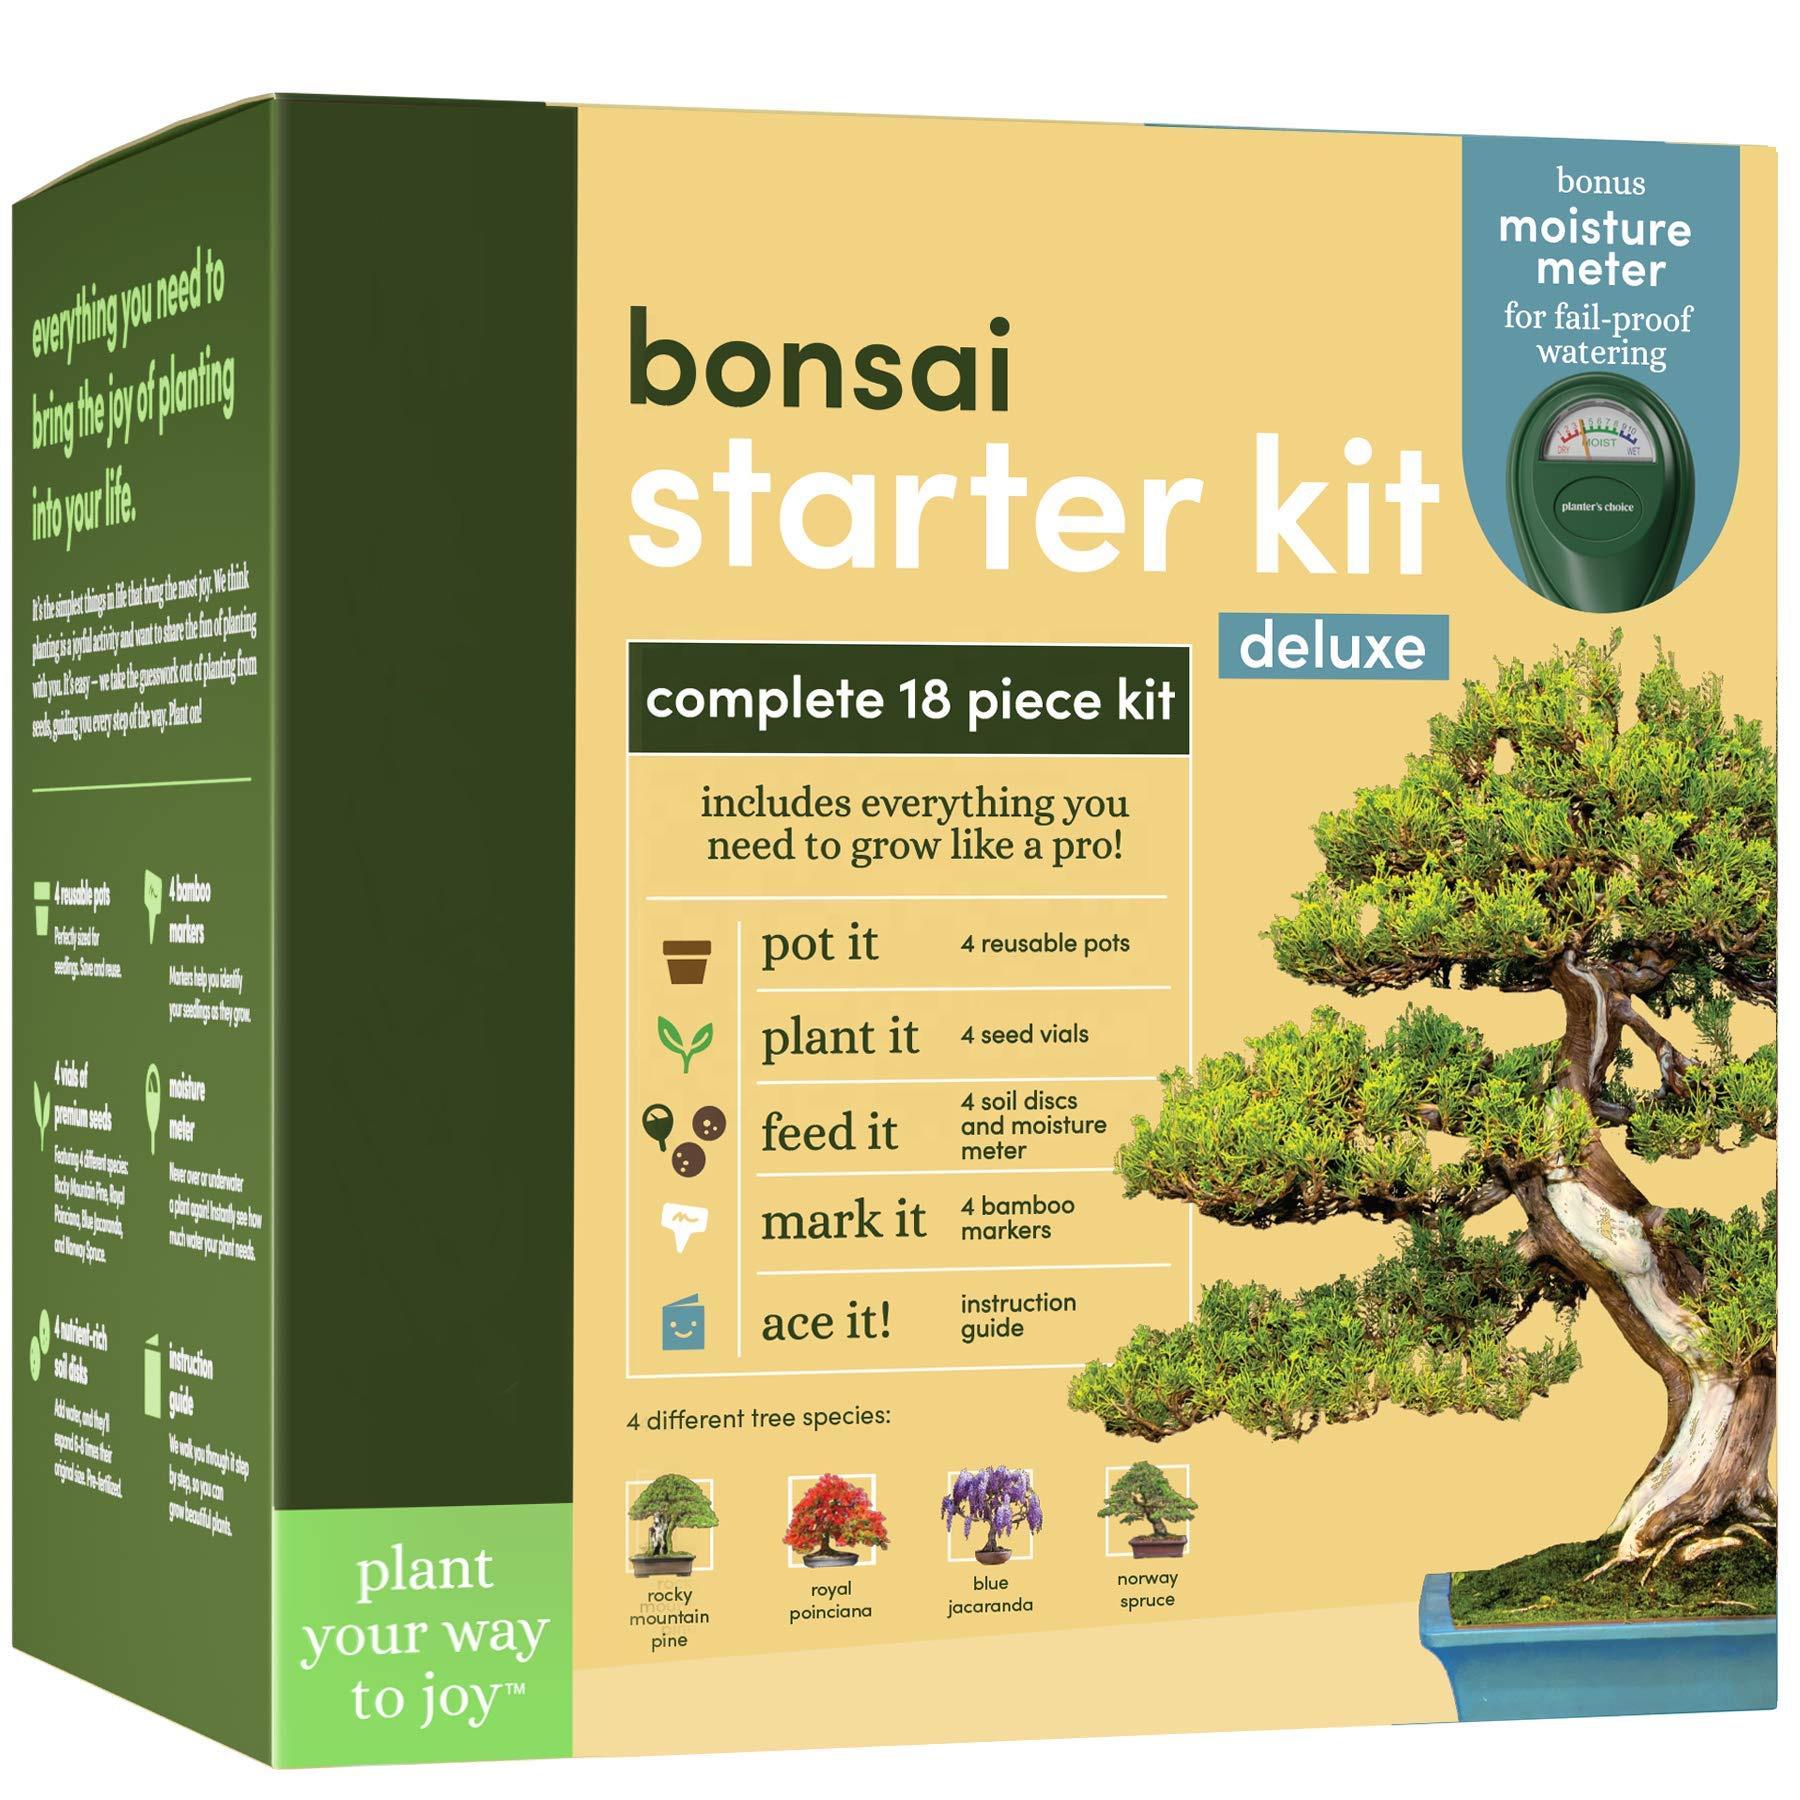 Wholesale Indoor Garden Bonsai Tree Seed Start Kit For Indoor Decoration Buy Bonsai Tree Bonsai Seed Start Kit Bonsai Tree Seed Start Kit For Indoor Decoration Product On Alibaba Com